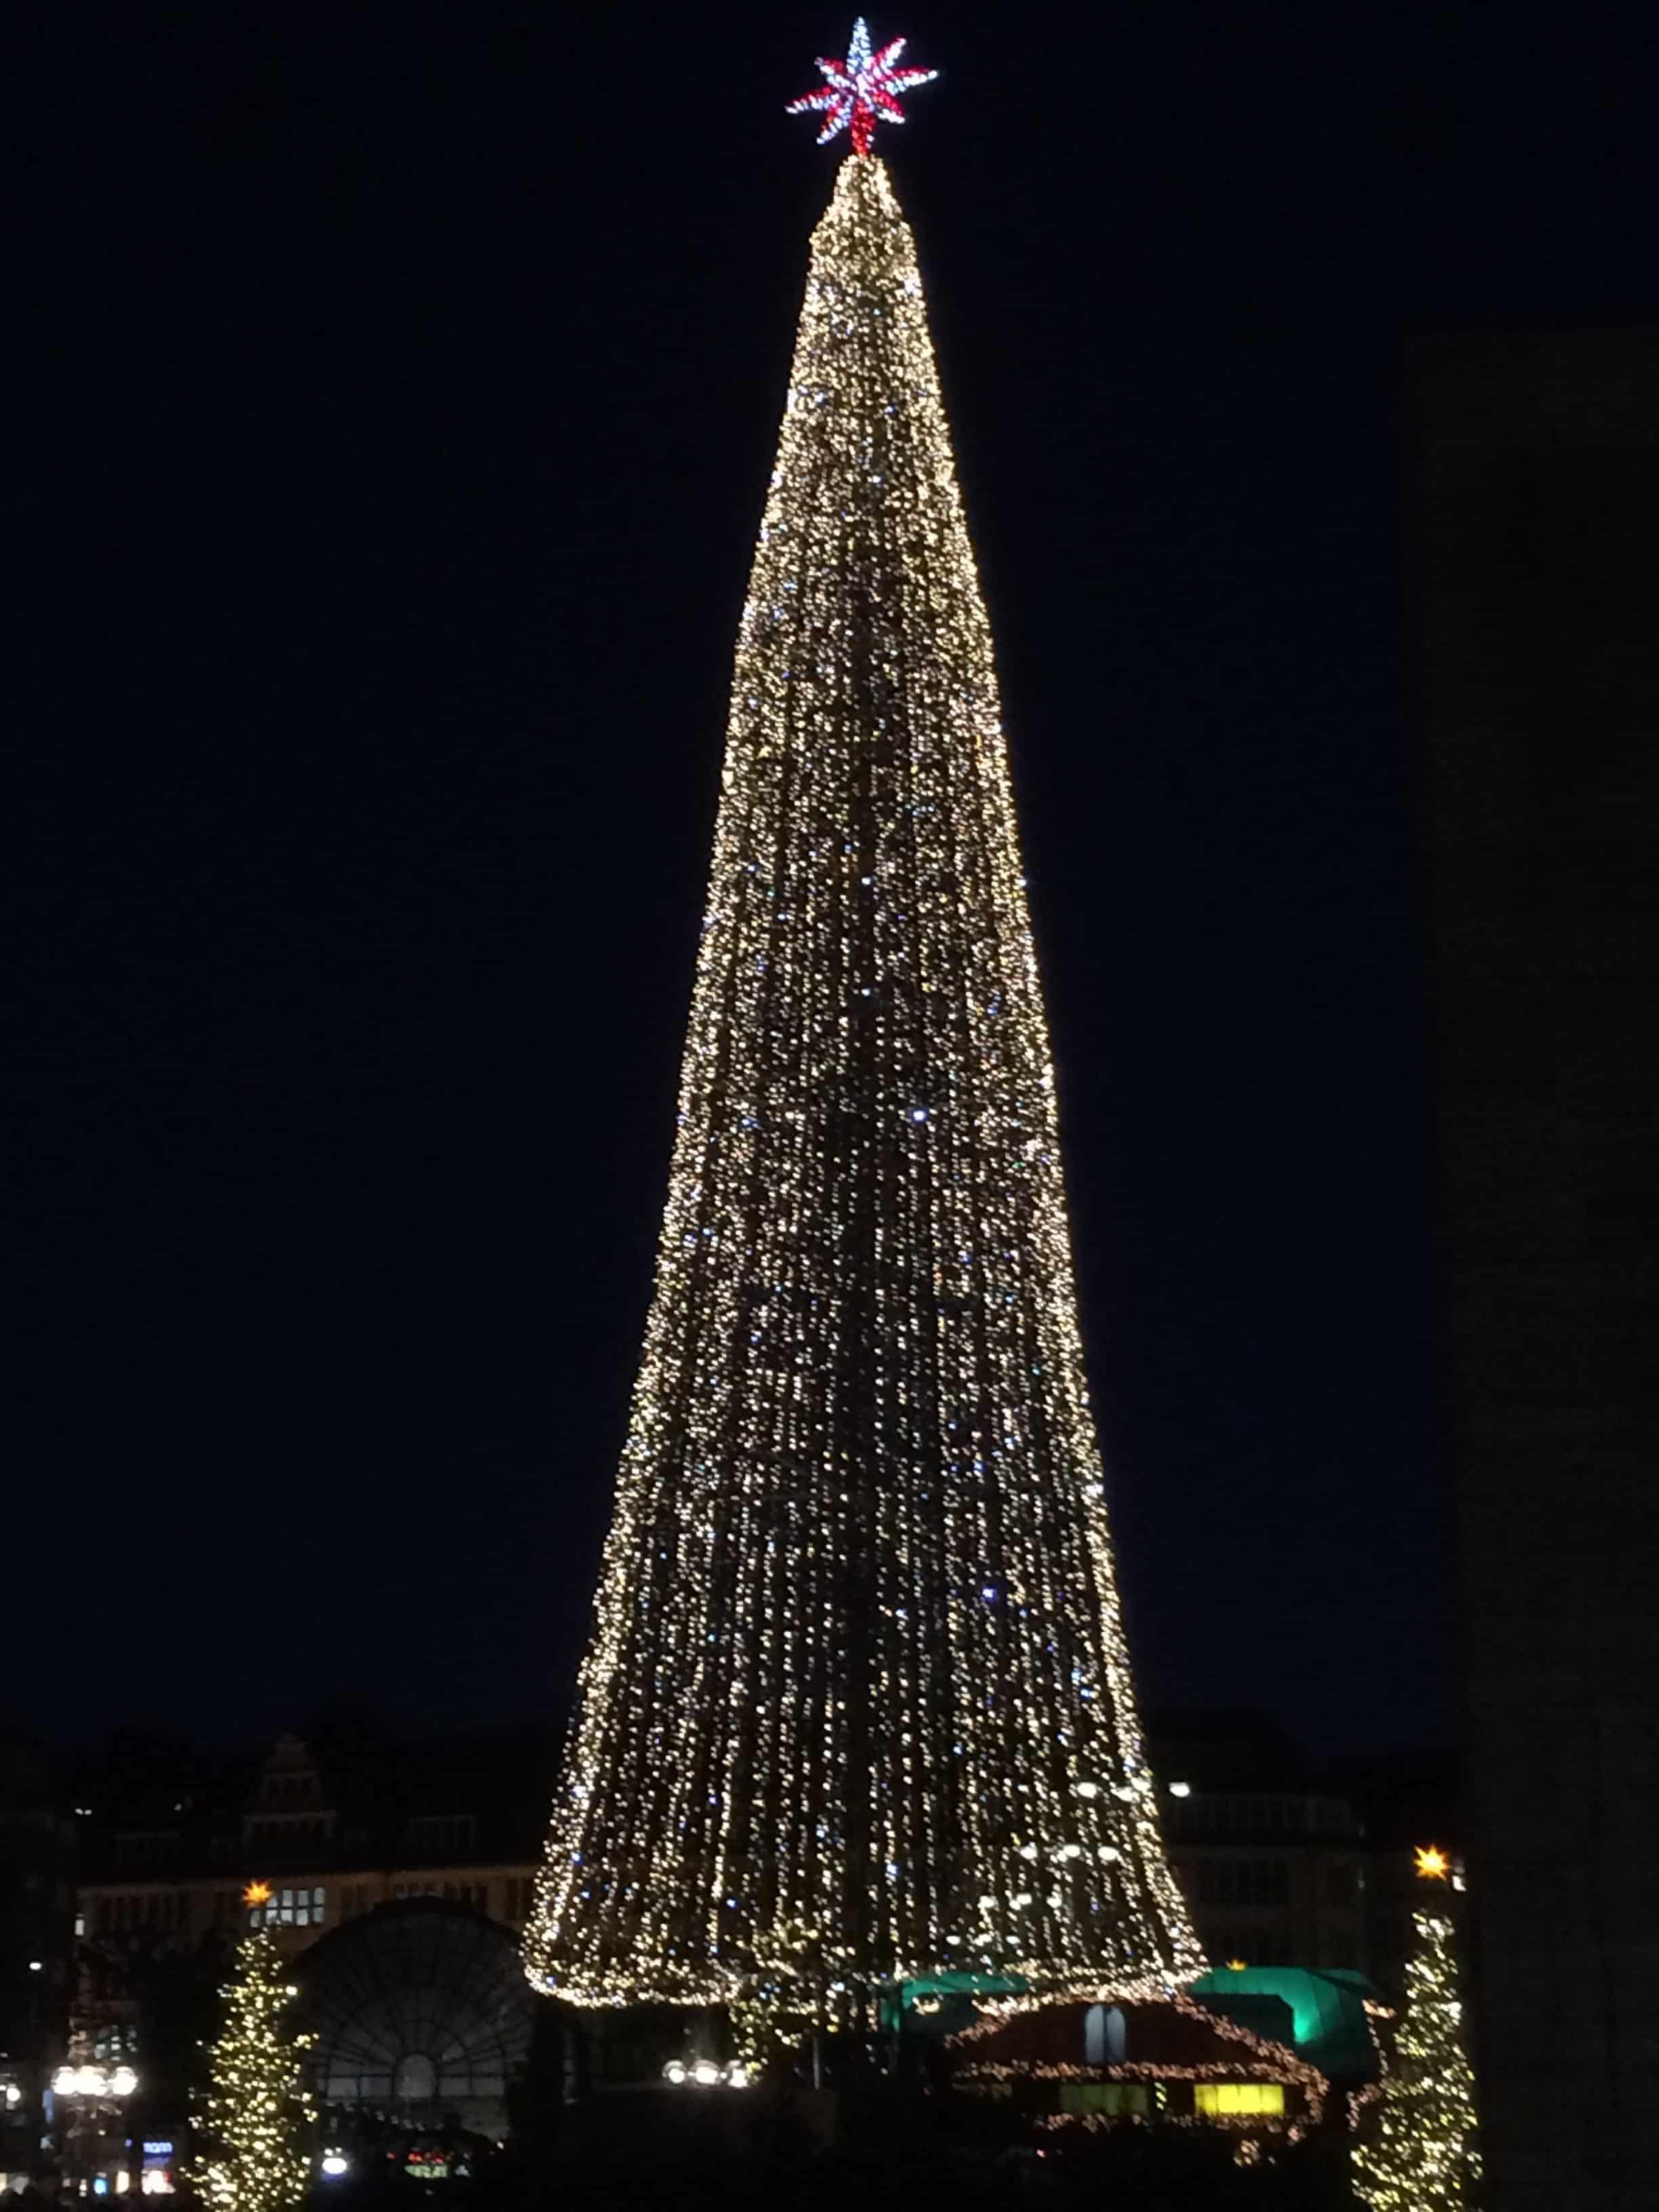 Juletræ på rådhuspladsen